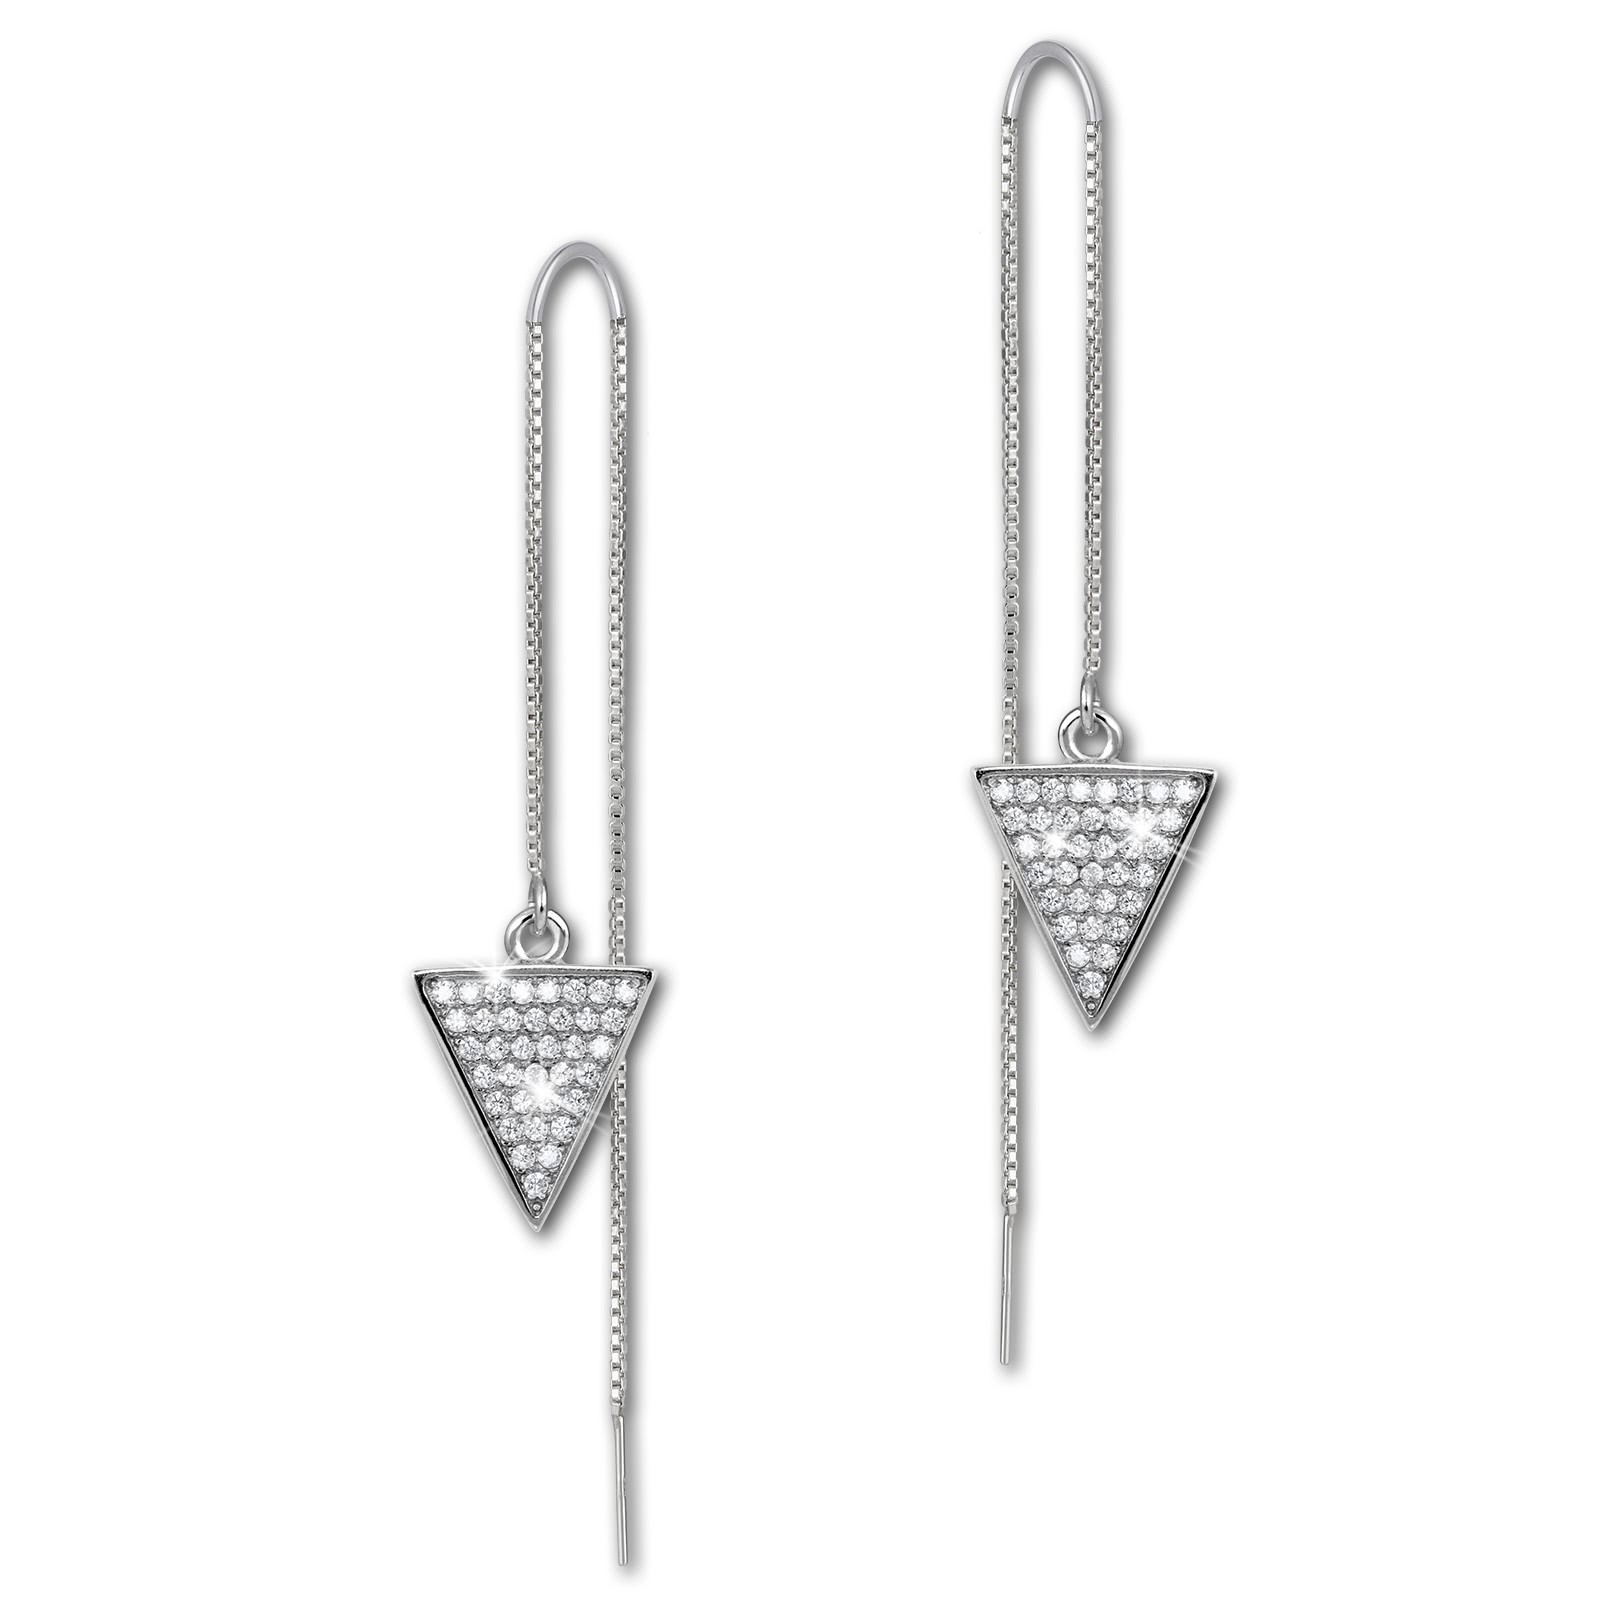 SilberDream Glitzer Ohrhänger Dreieck Zirkonia weiß 925er Silber Ohrring GSO442W